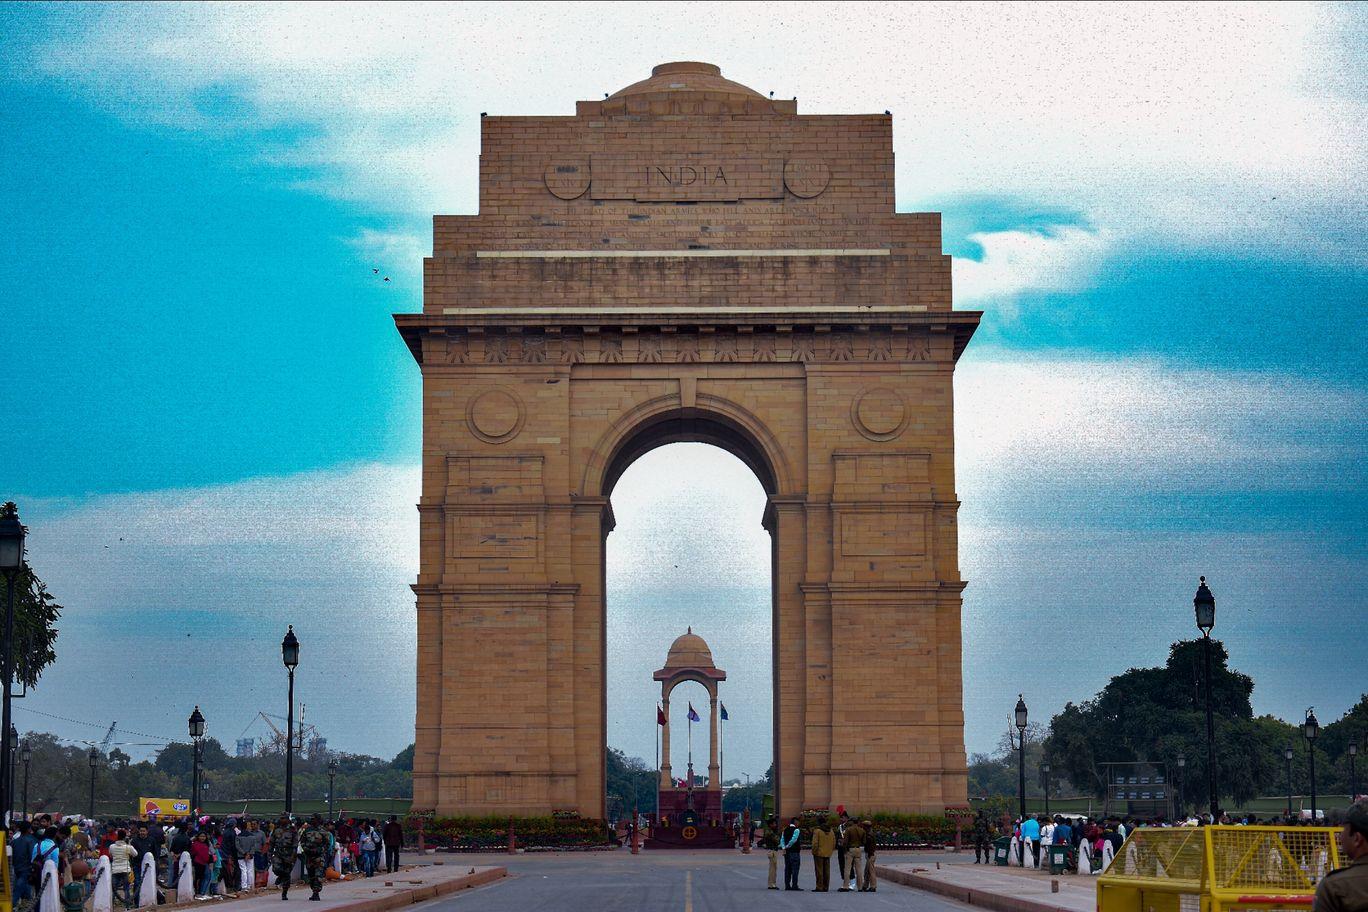 Photo of India Gate By हिप्पी दाई